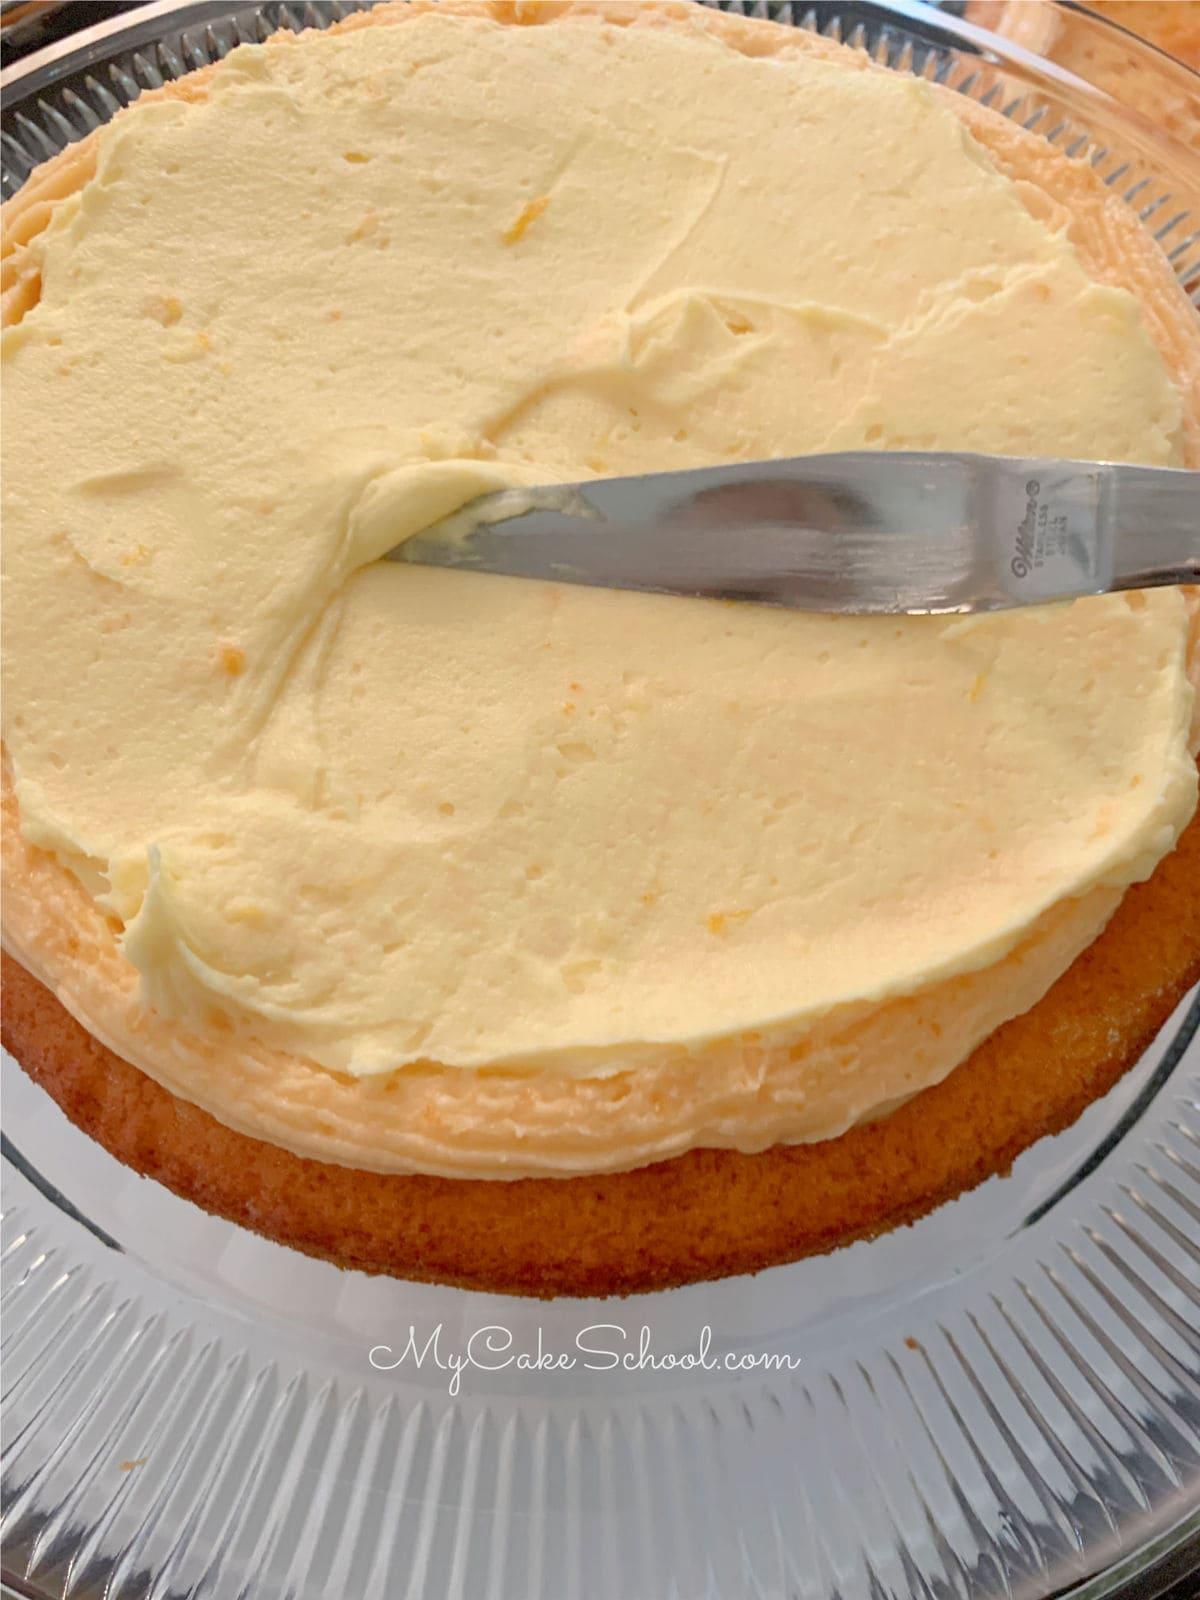 Orange Dreamsicle Cake- A Doctored Cake Mix